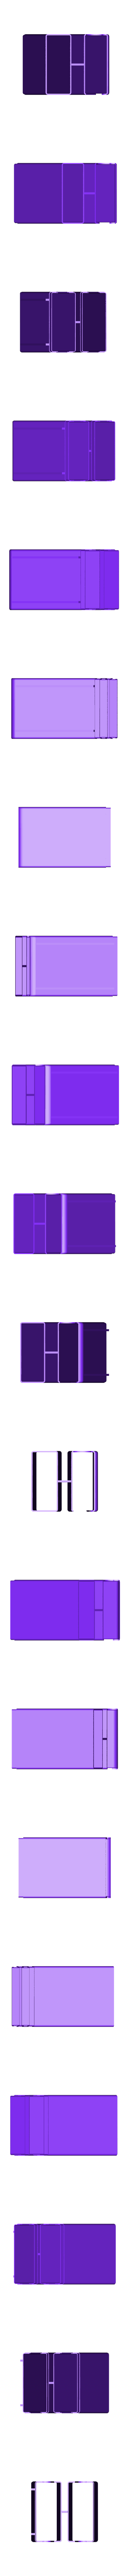 dispensador yogures Part2.stl Download free STL file Liquid Yogurt Dispenser • 3D printer template, Pipapelaa